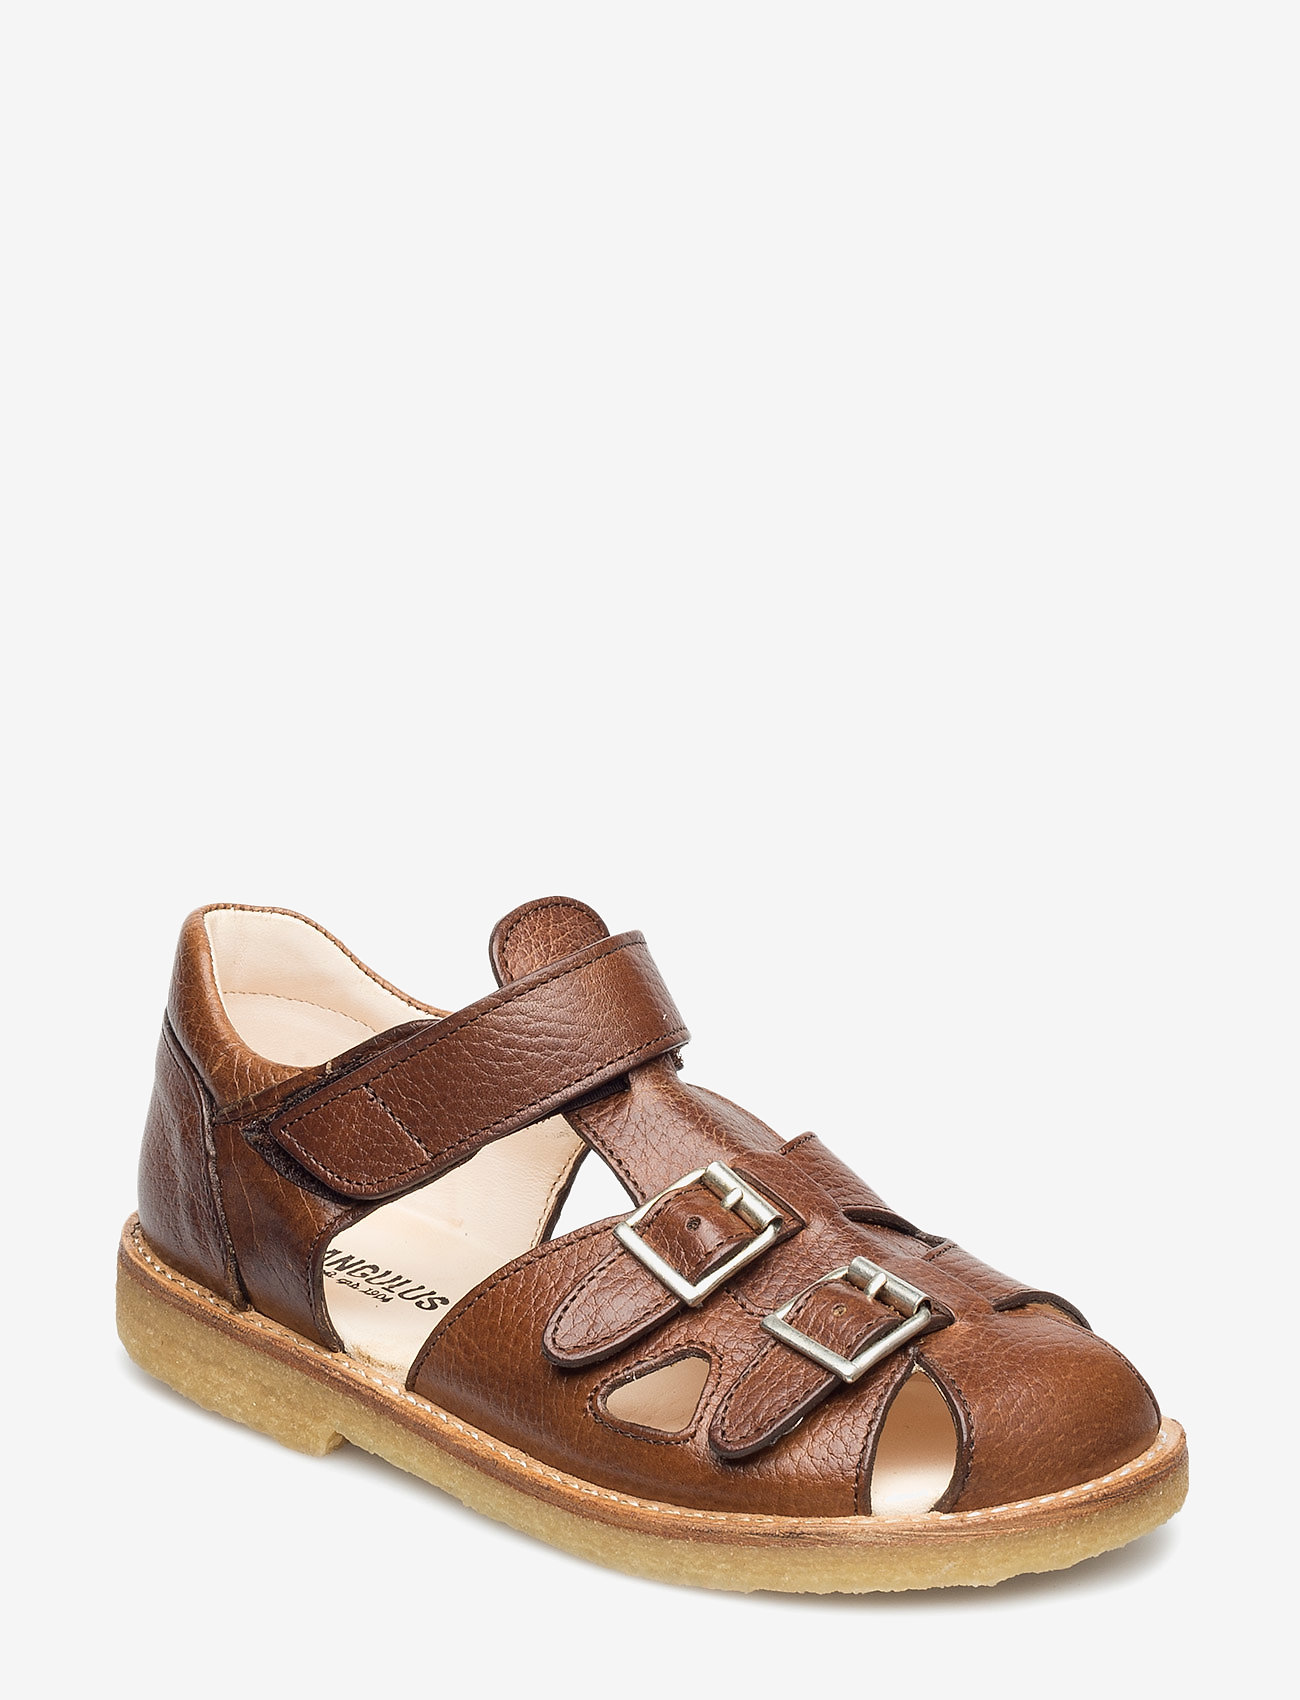 ANGULUS - Sandals - flat - closed toe -  - sandały z paskiem - 2509 cognac - 0